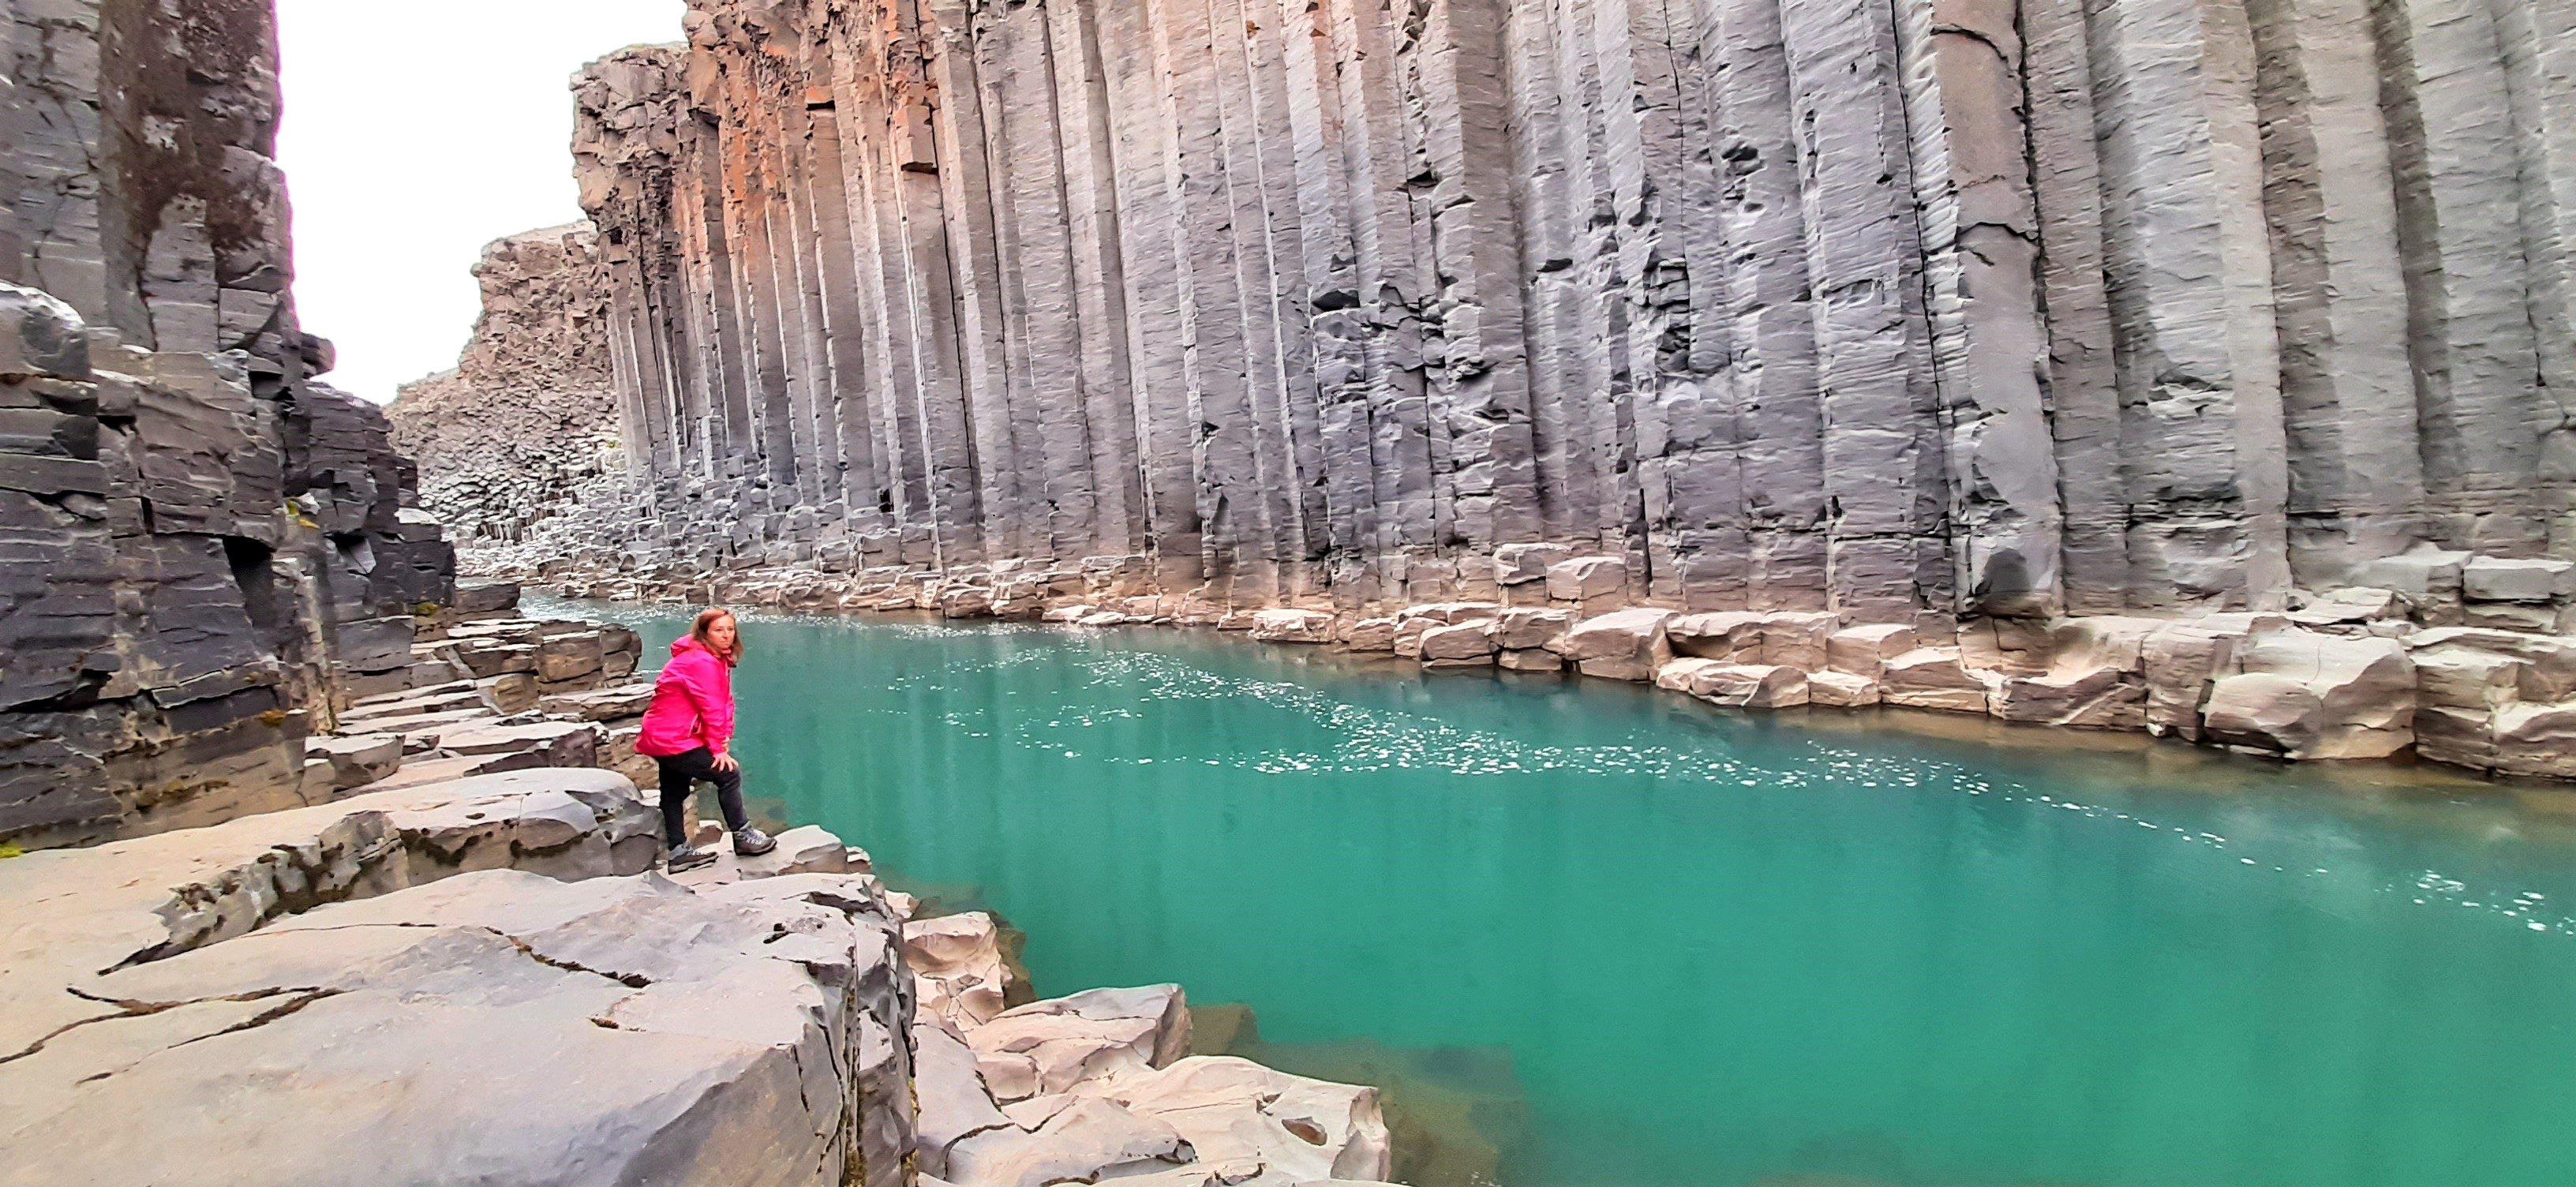 Stuðlagil Canyon